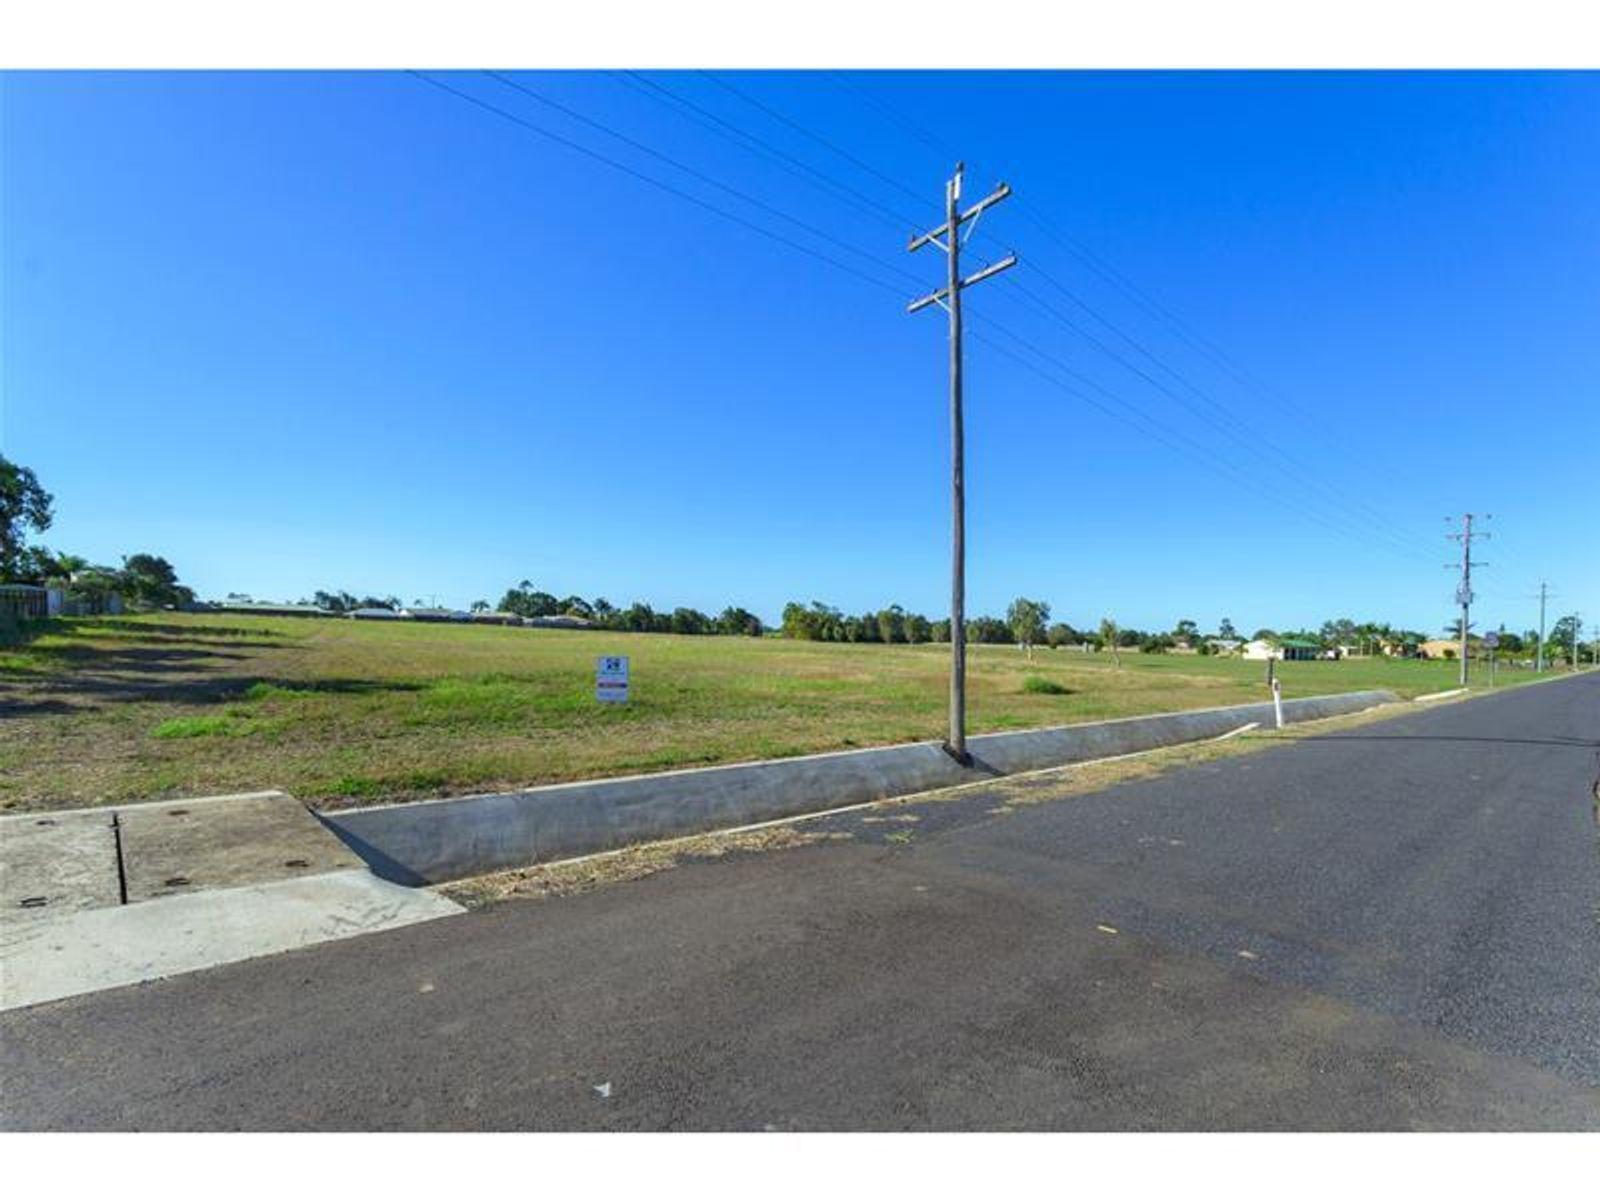 83 Whittingtons Road, Bundaberg North, QLD 4670